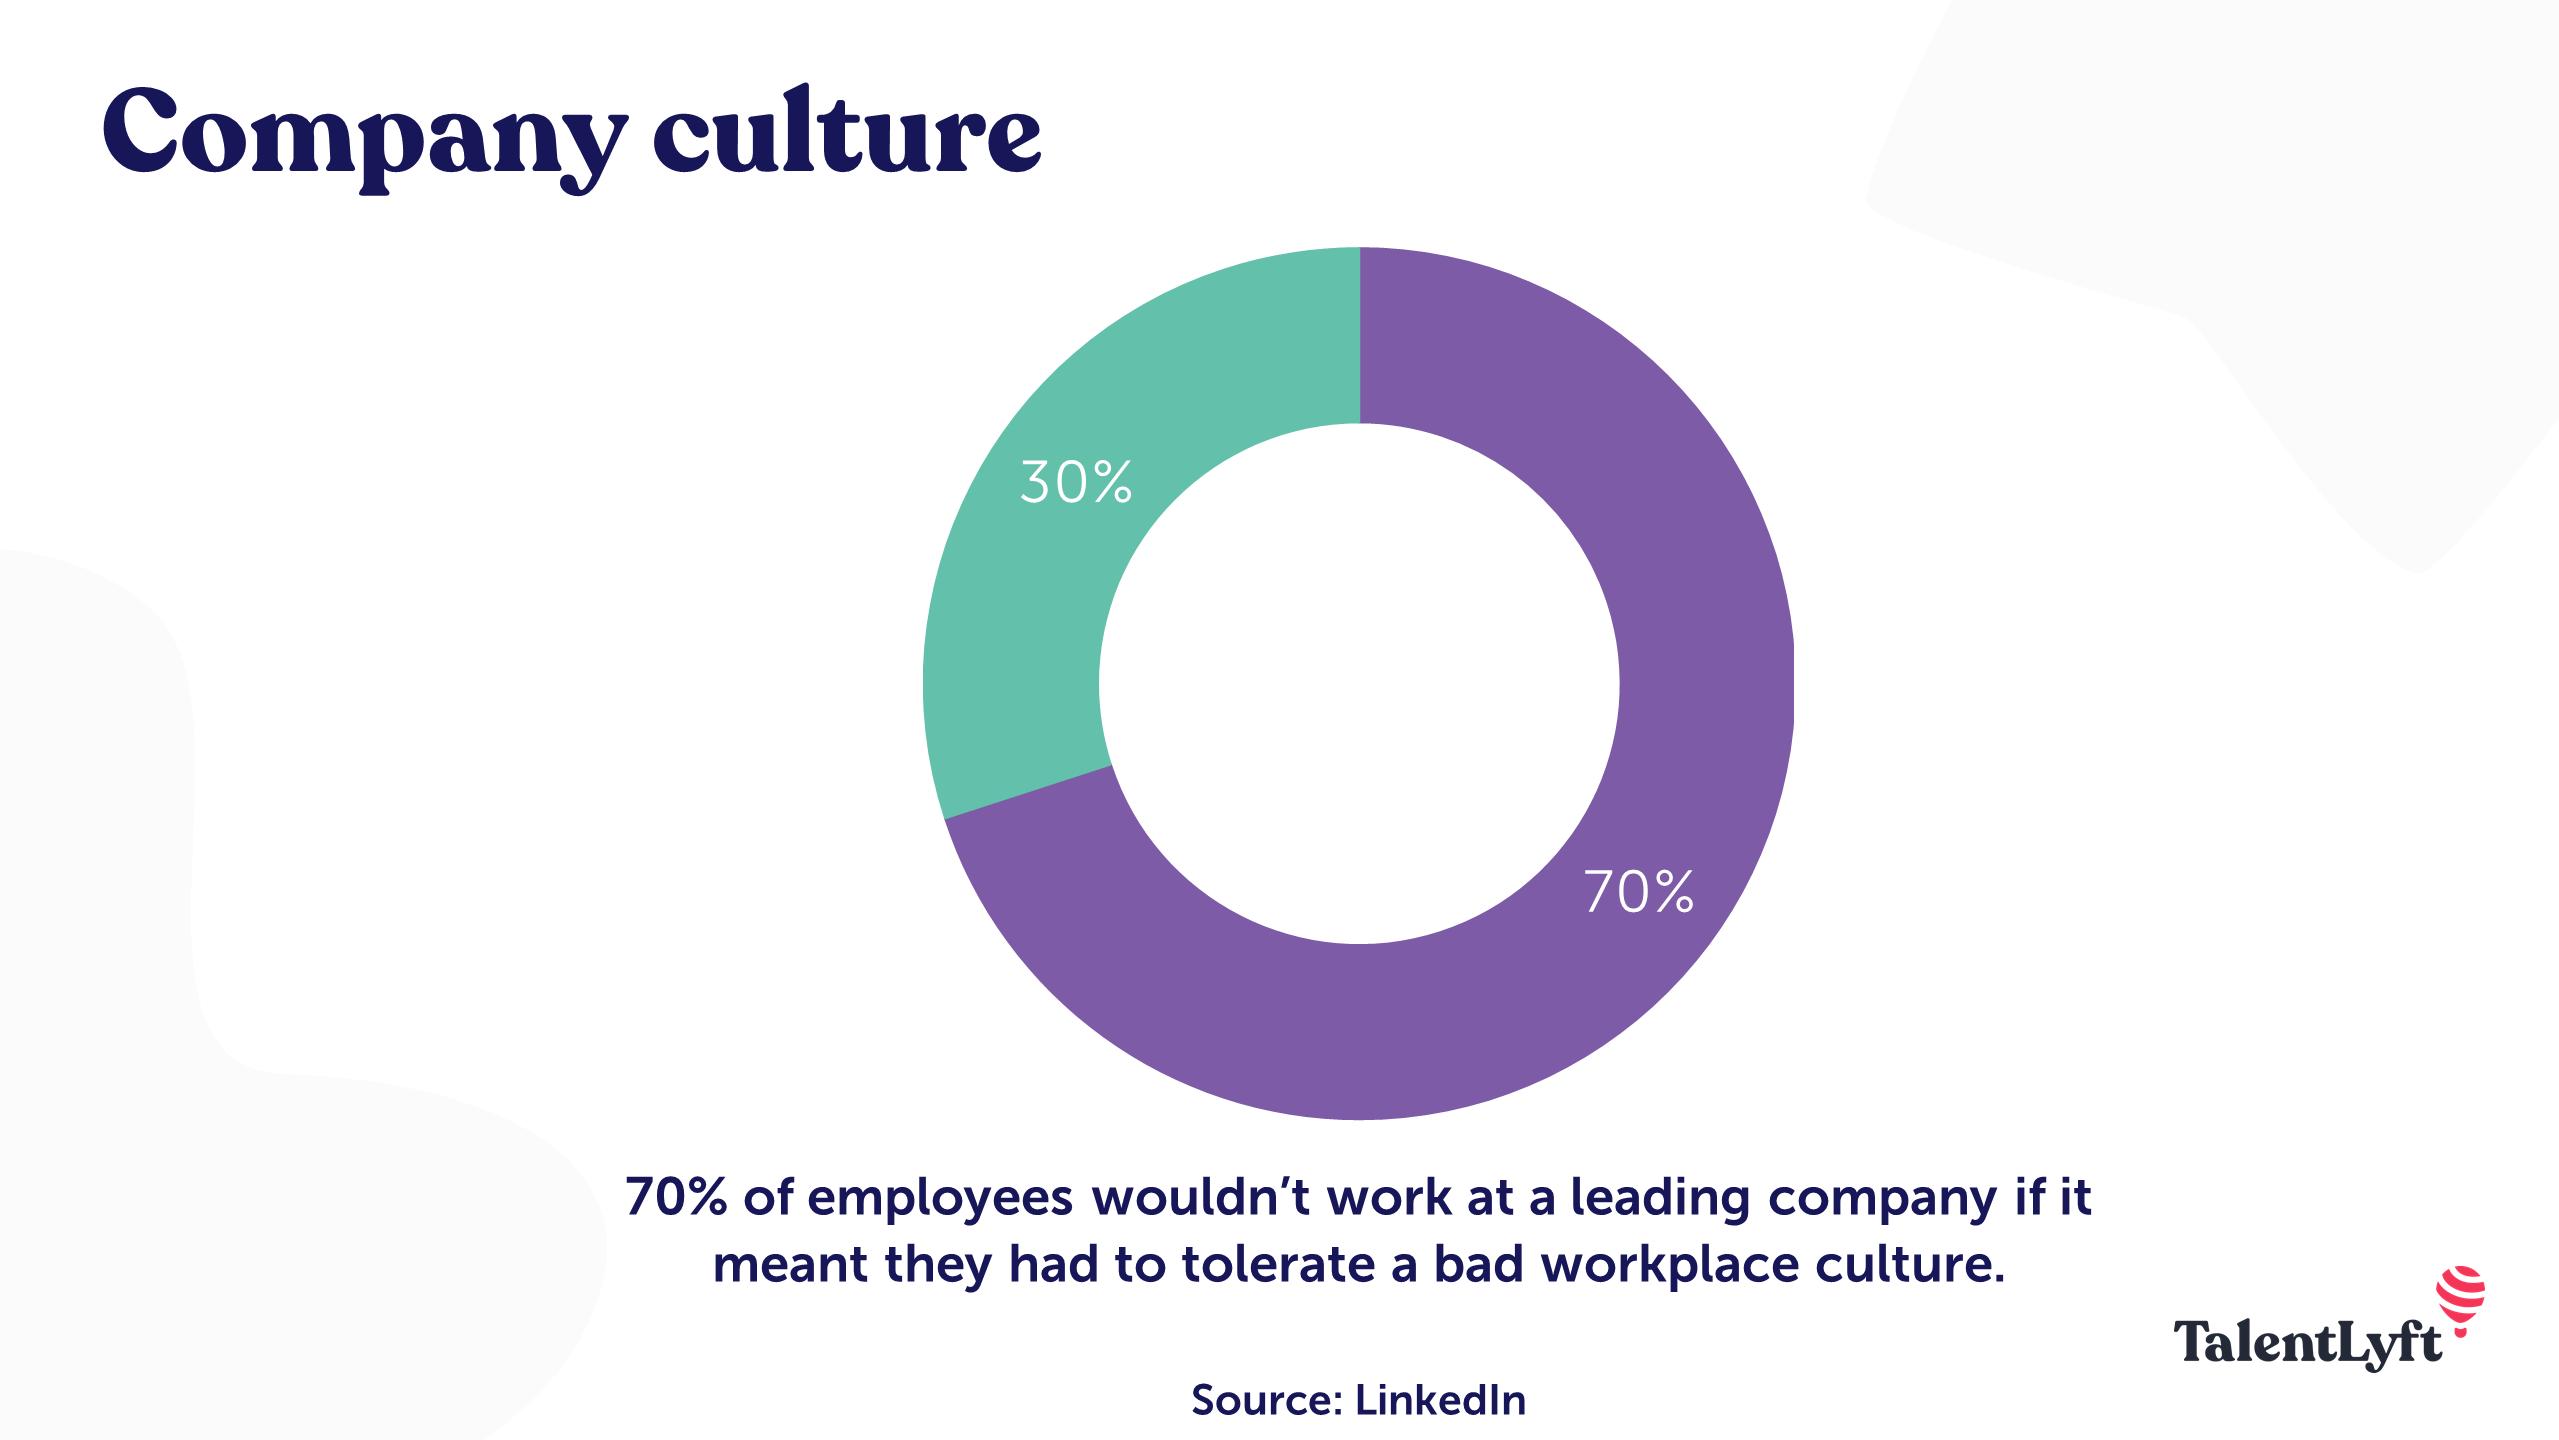 Company culture importance